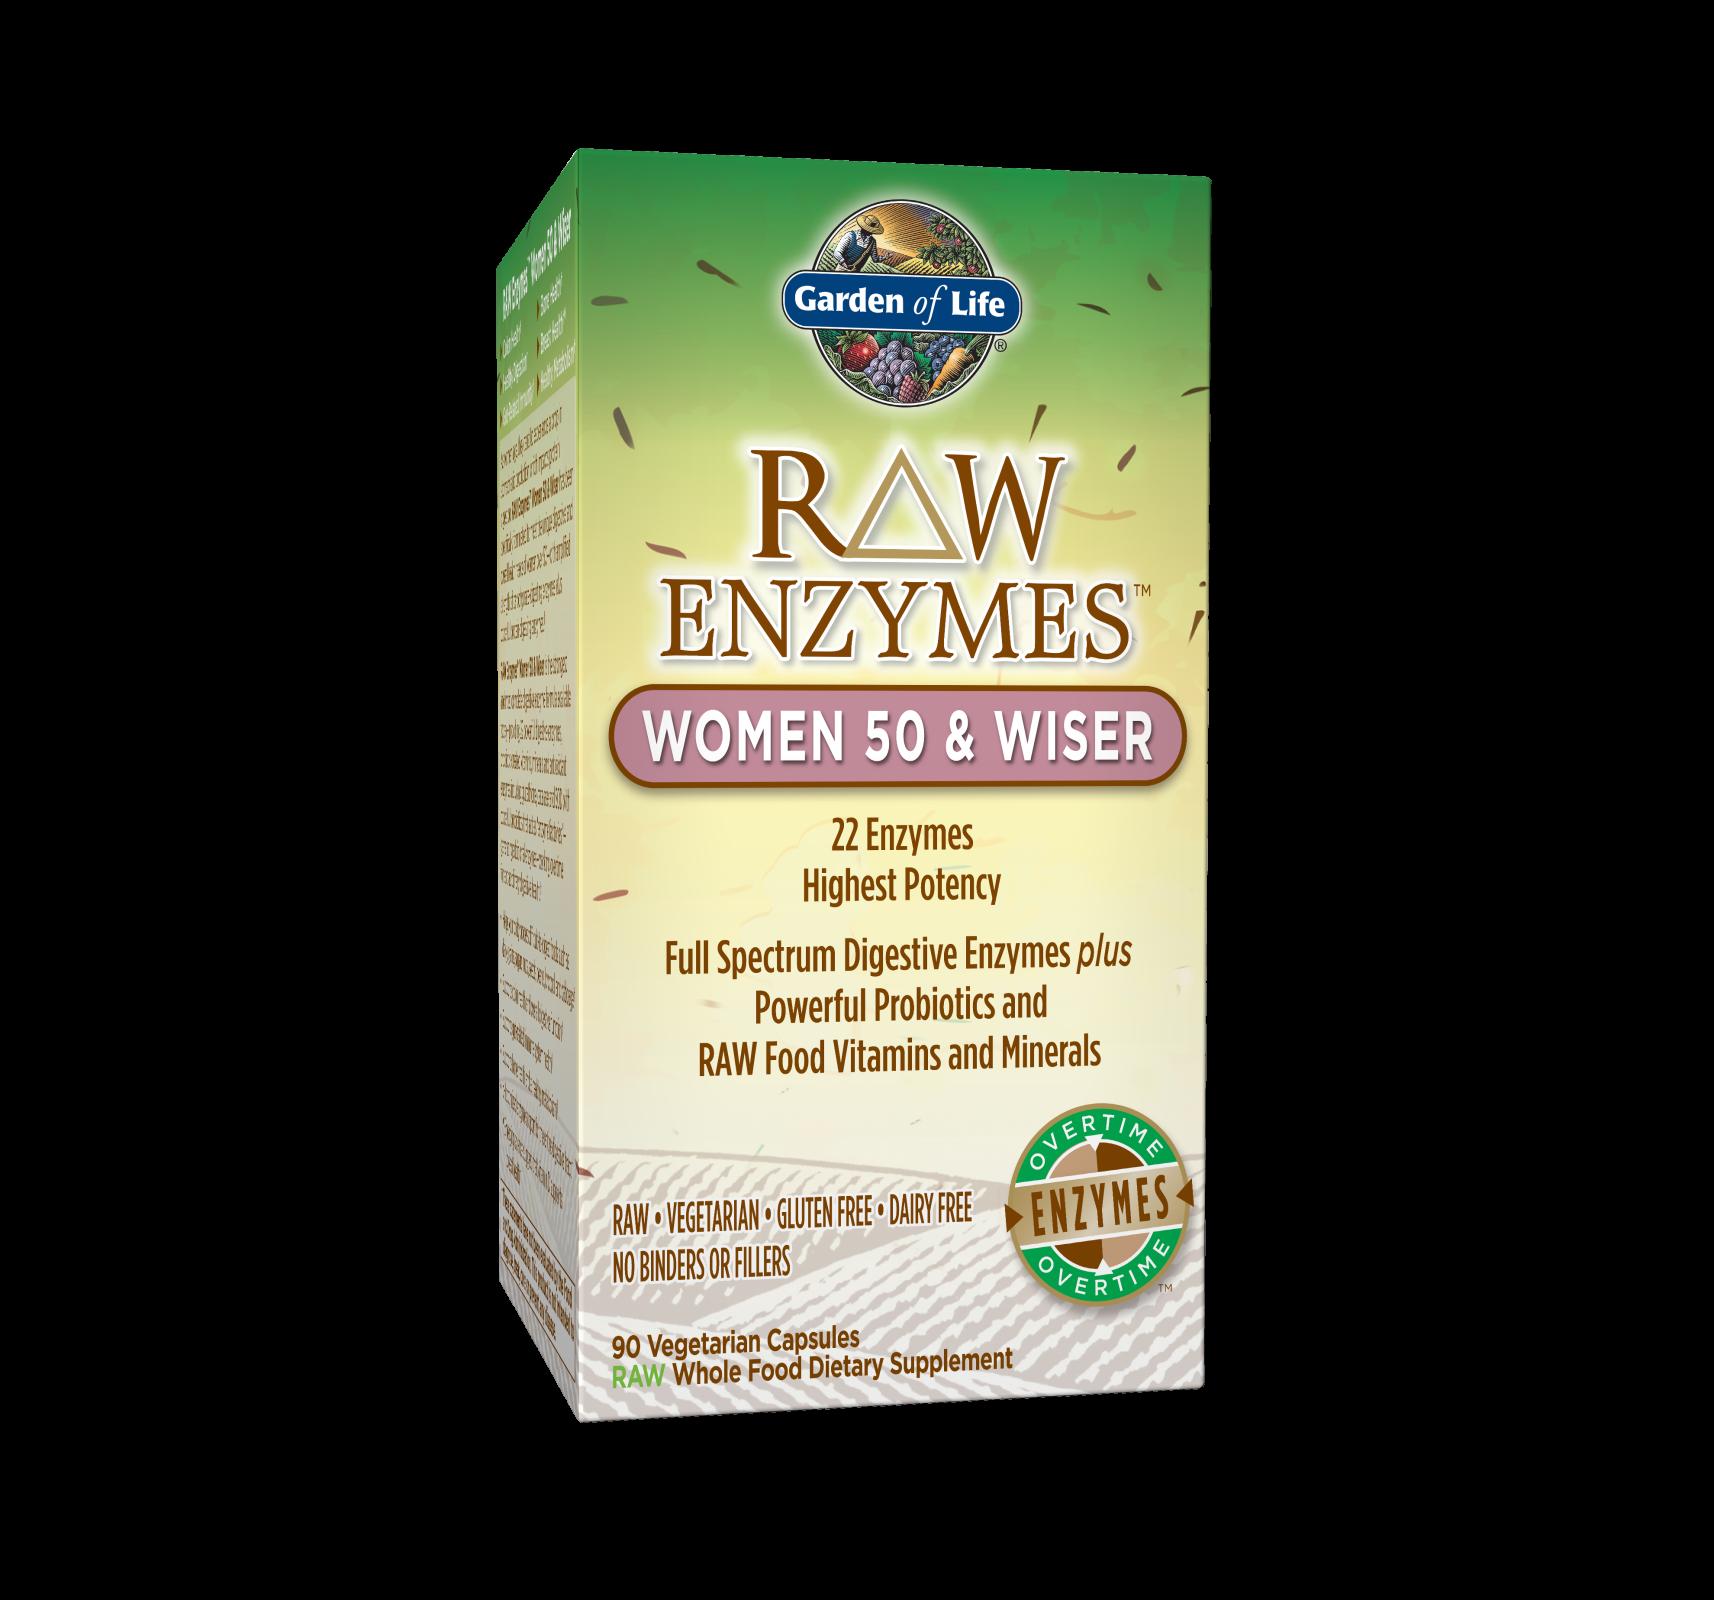 RAW Enzymes Women 50 & Wiser (90 Vegi-Caps)